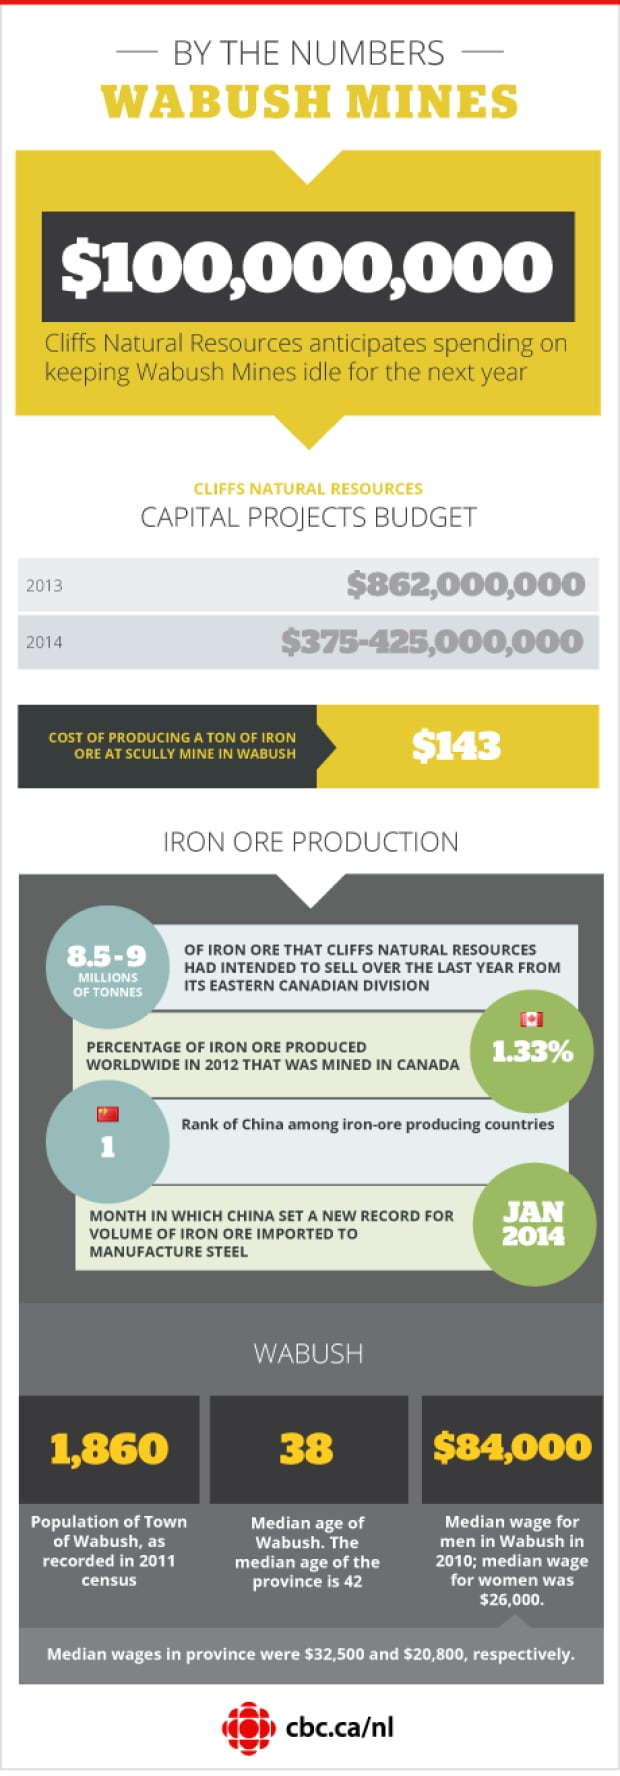 Wabush Mines infographic